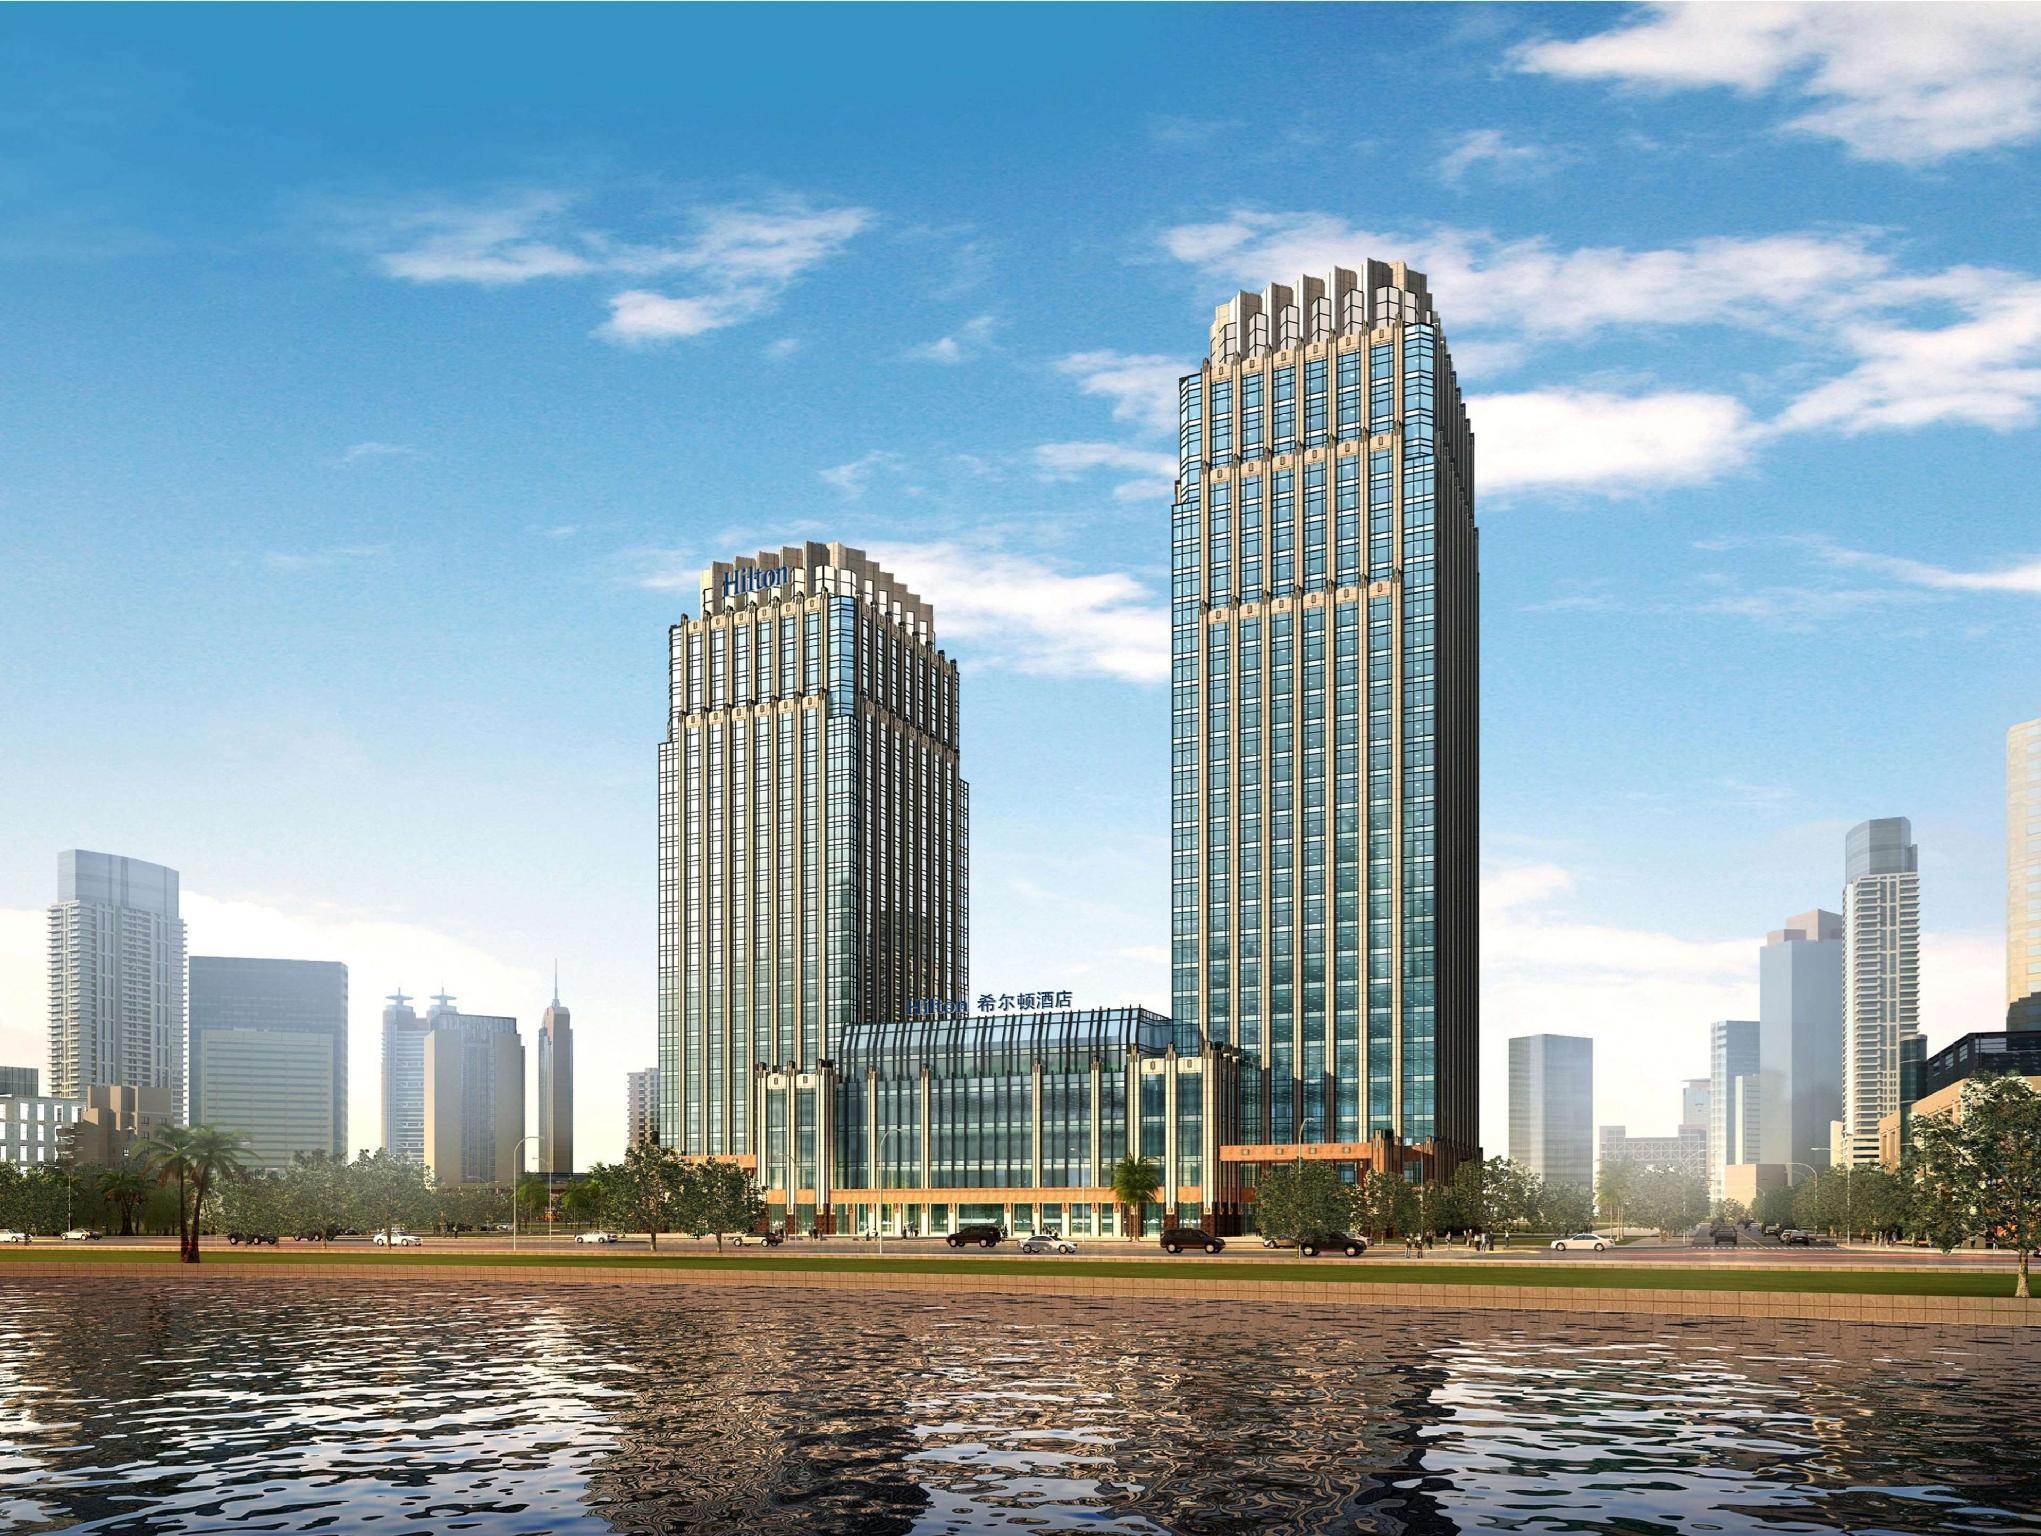 🟊🟊🟊🟊 Hilton Quanzhou Riverside - Quanzhou - China